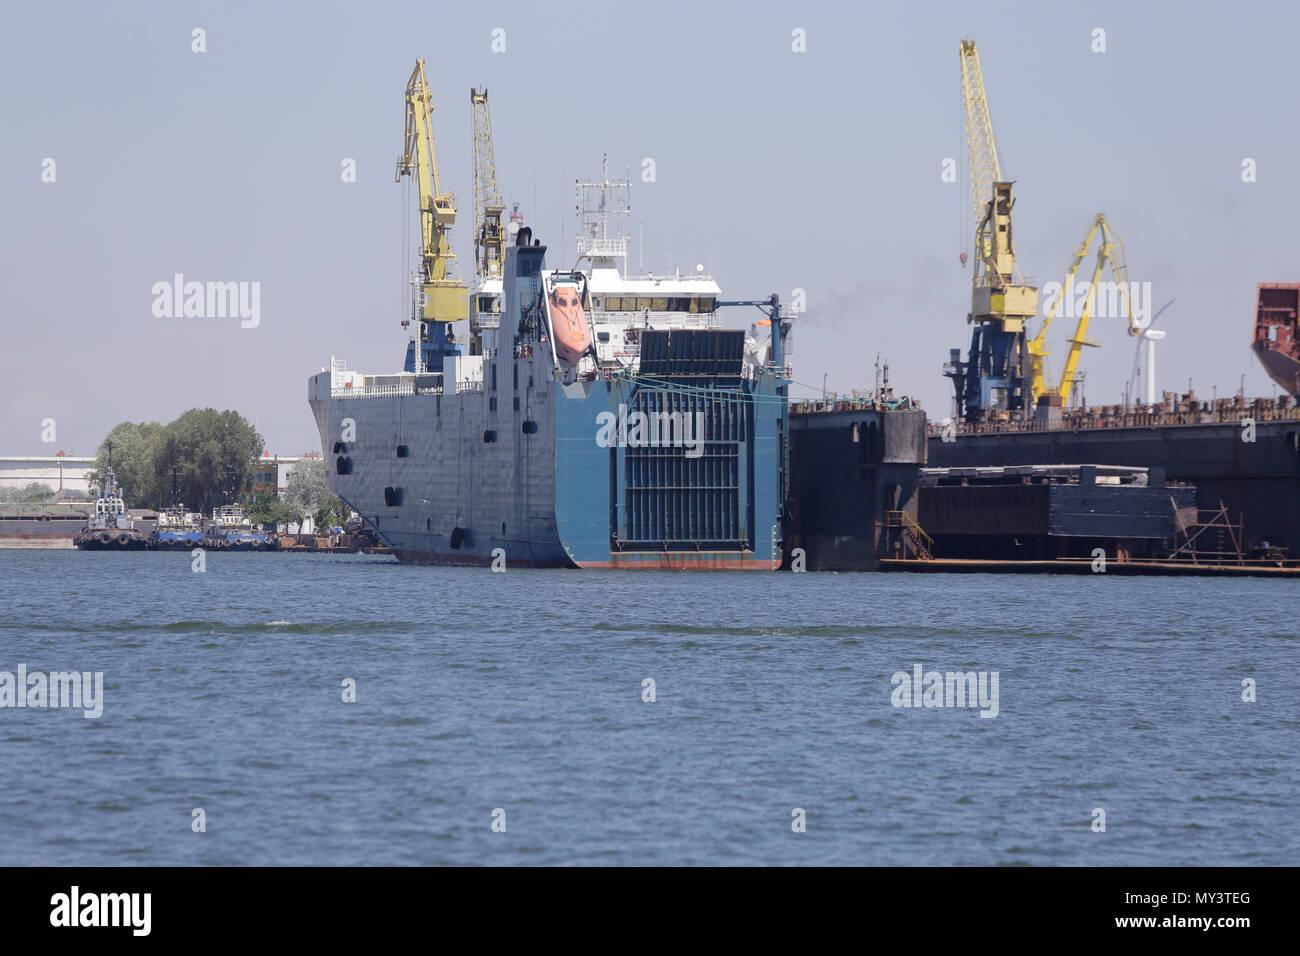 CONSTANTA, ROMANIA - MAY 19, 2018: Old ship dismantling docks - Stock Image